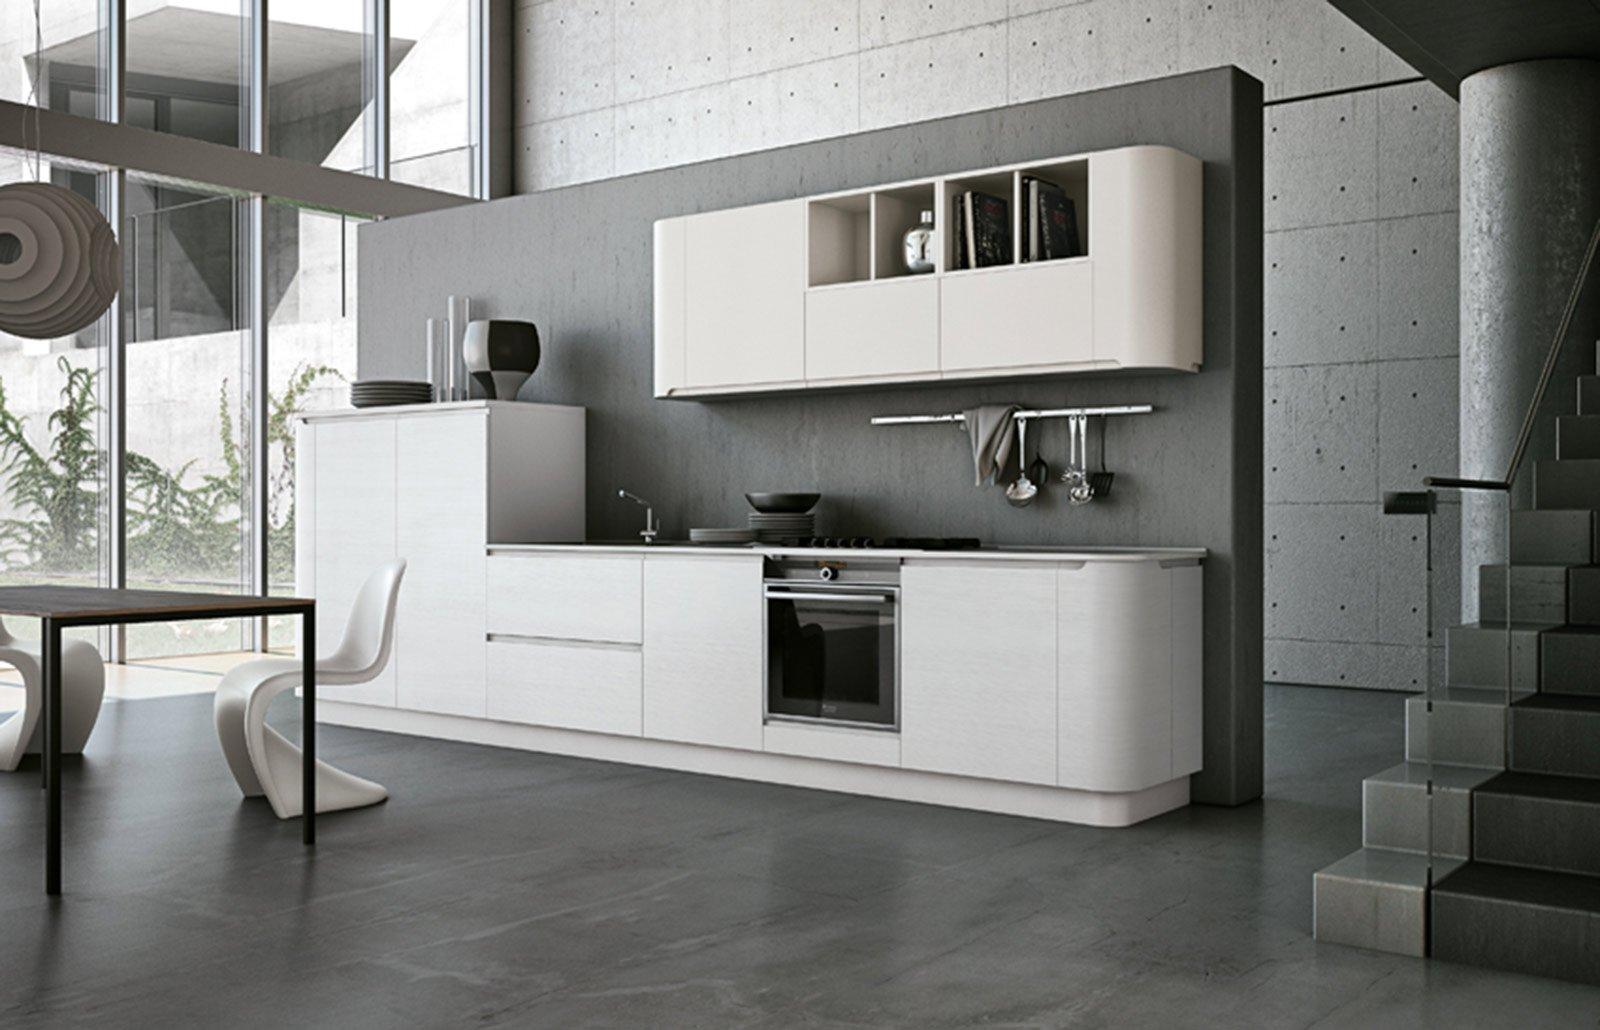 Cucine in laminato cose di casa - Ante per cucina laccate prezzi ...